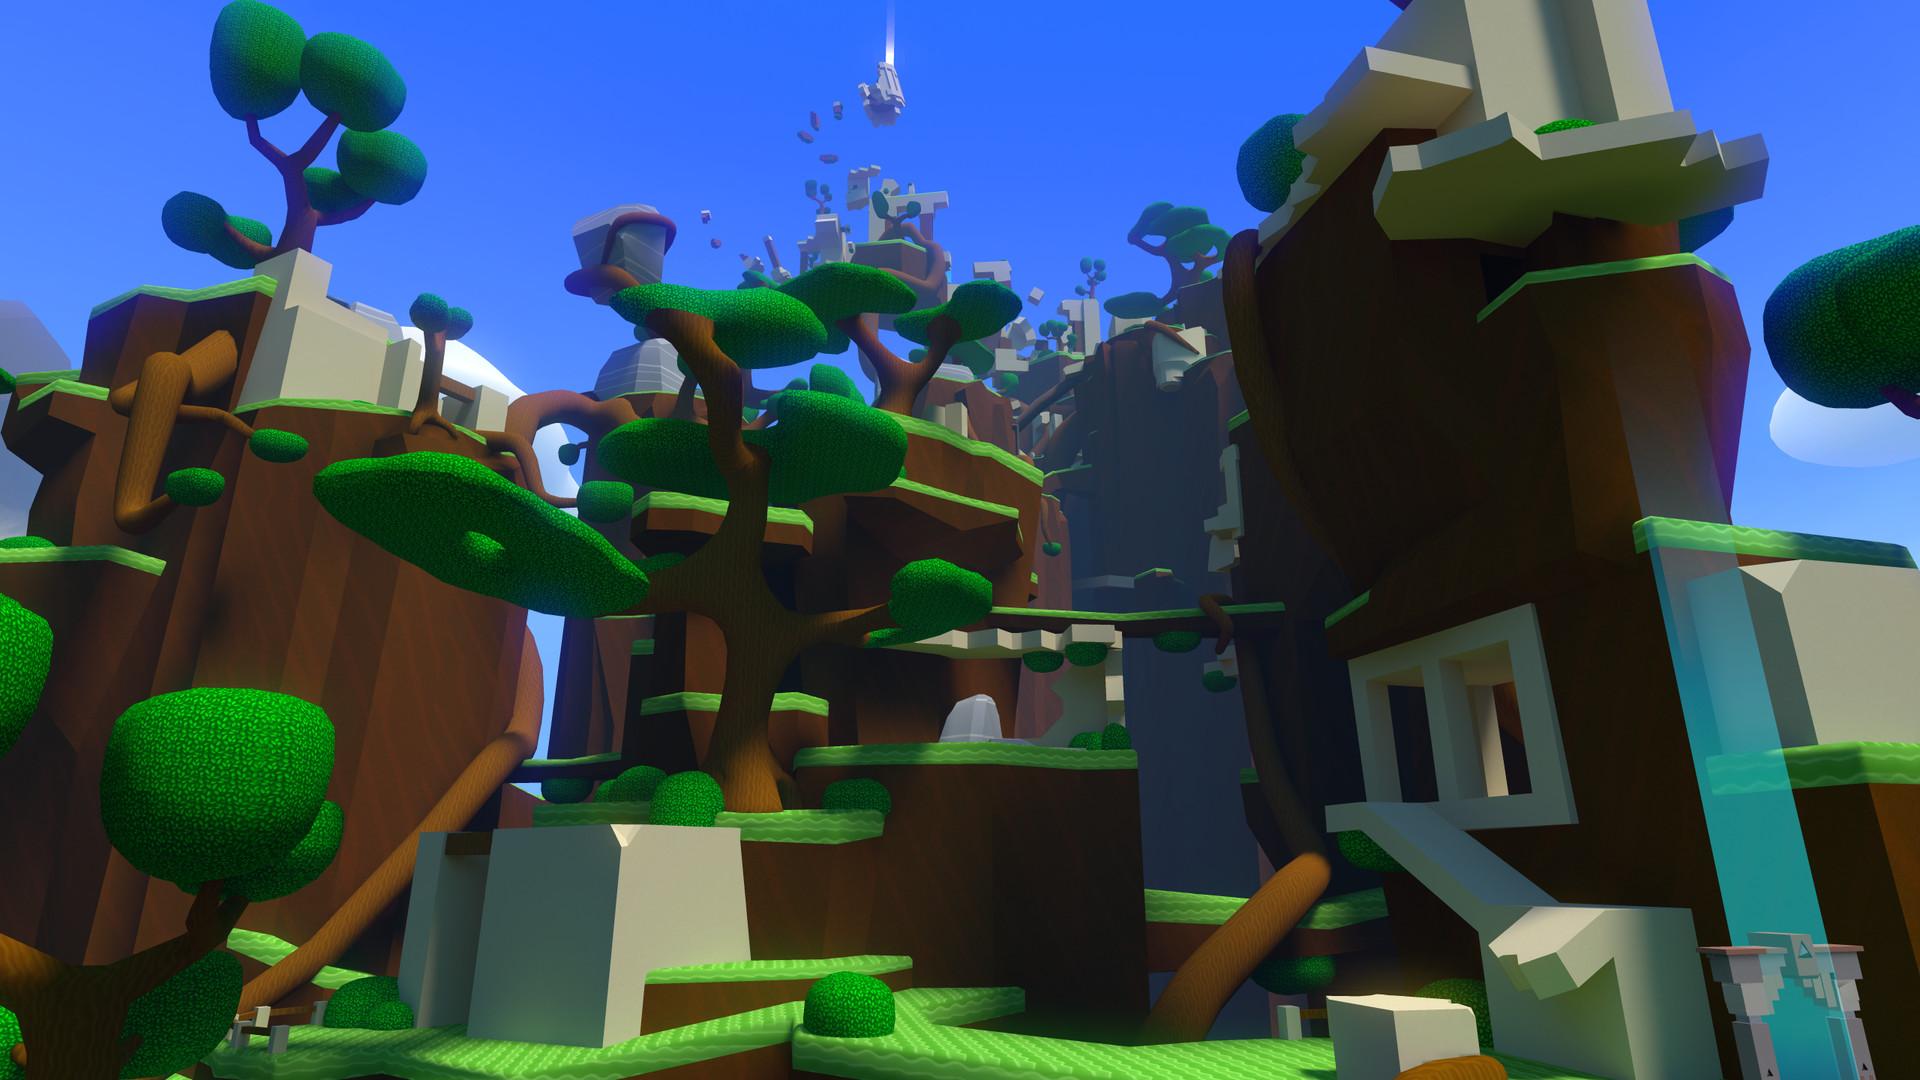 Oculus Quest 游戏《Windlands VR》御风飞行插图(2)